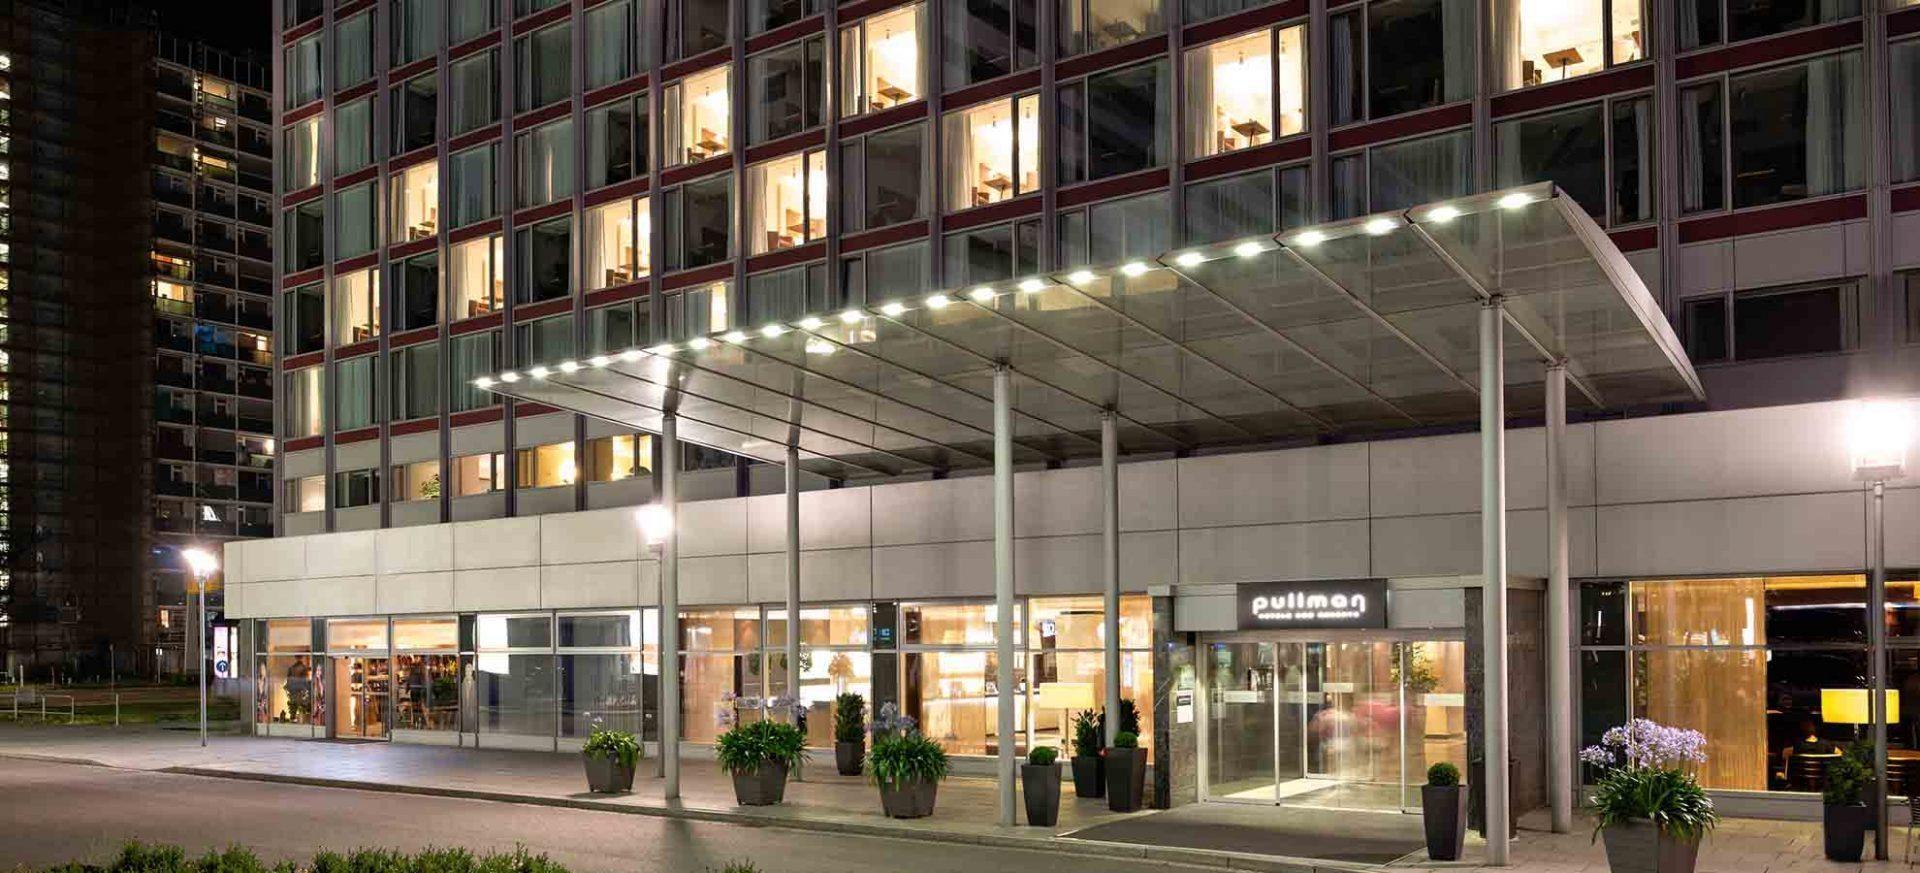 Galerie pullman hotel dresden newa for Pullman hotel dresden